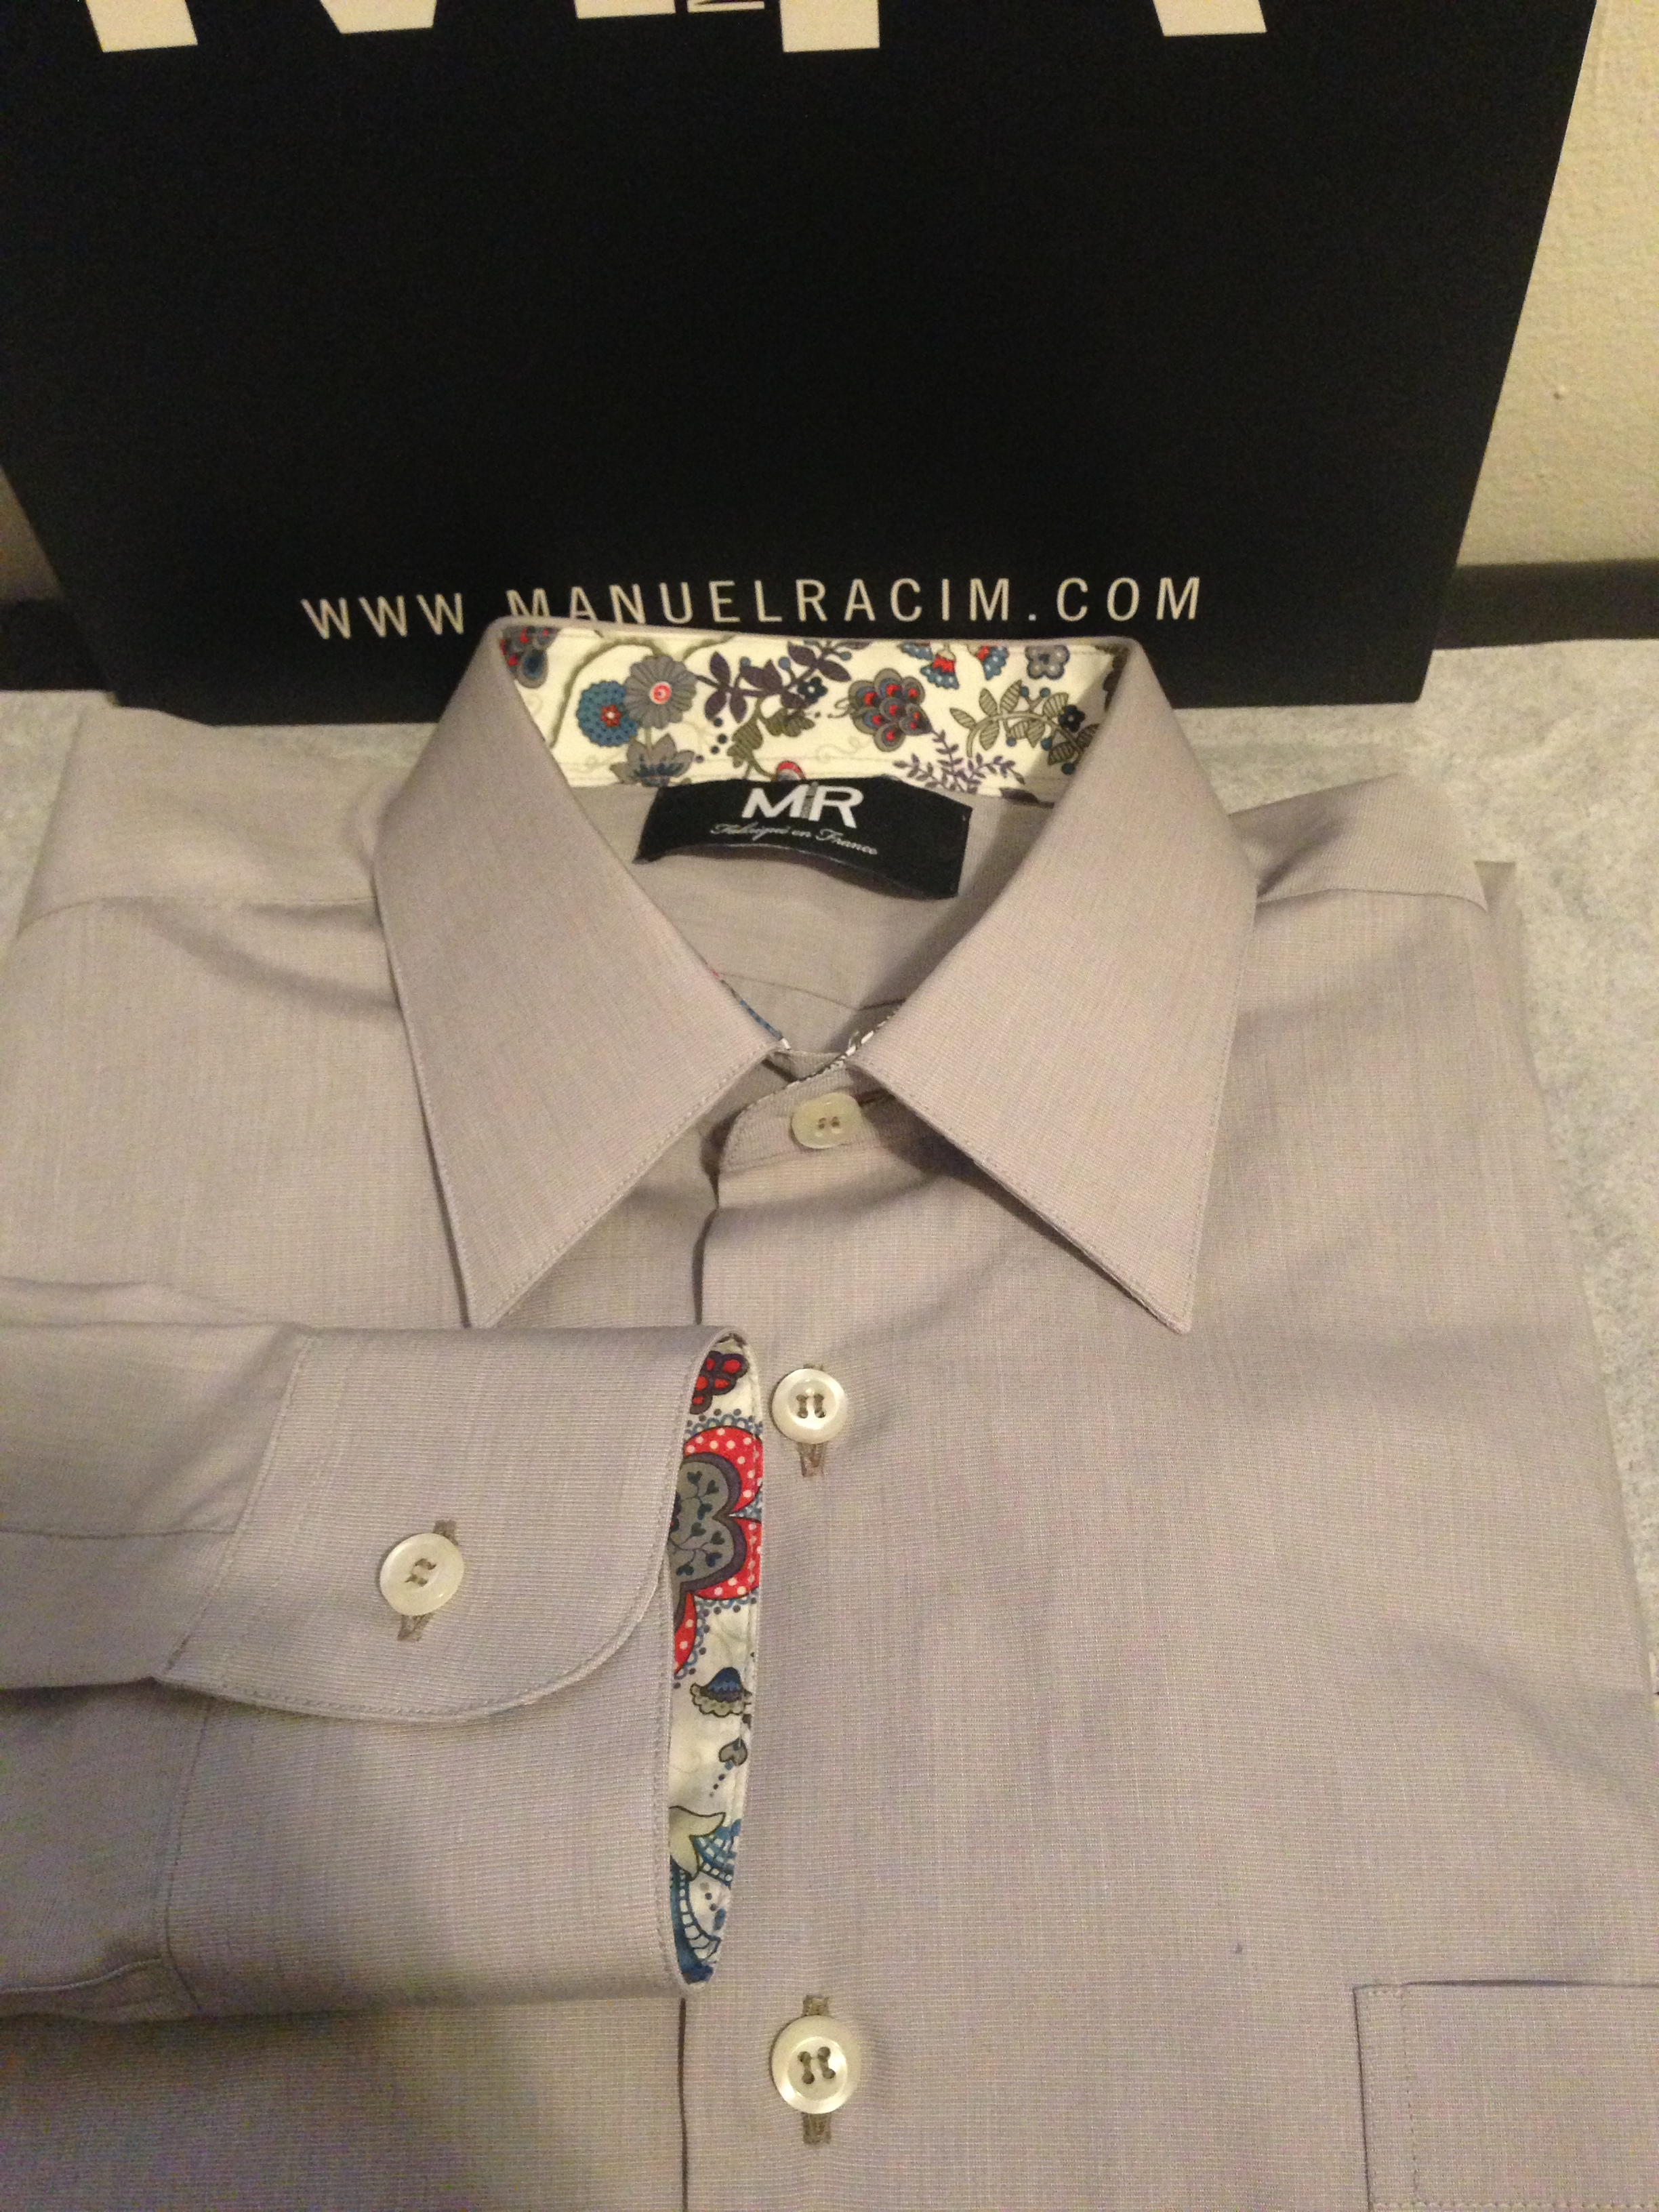 manuel-racim-shirt-4